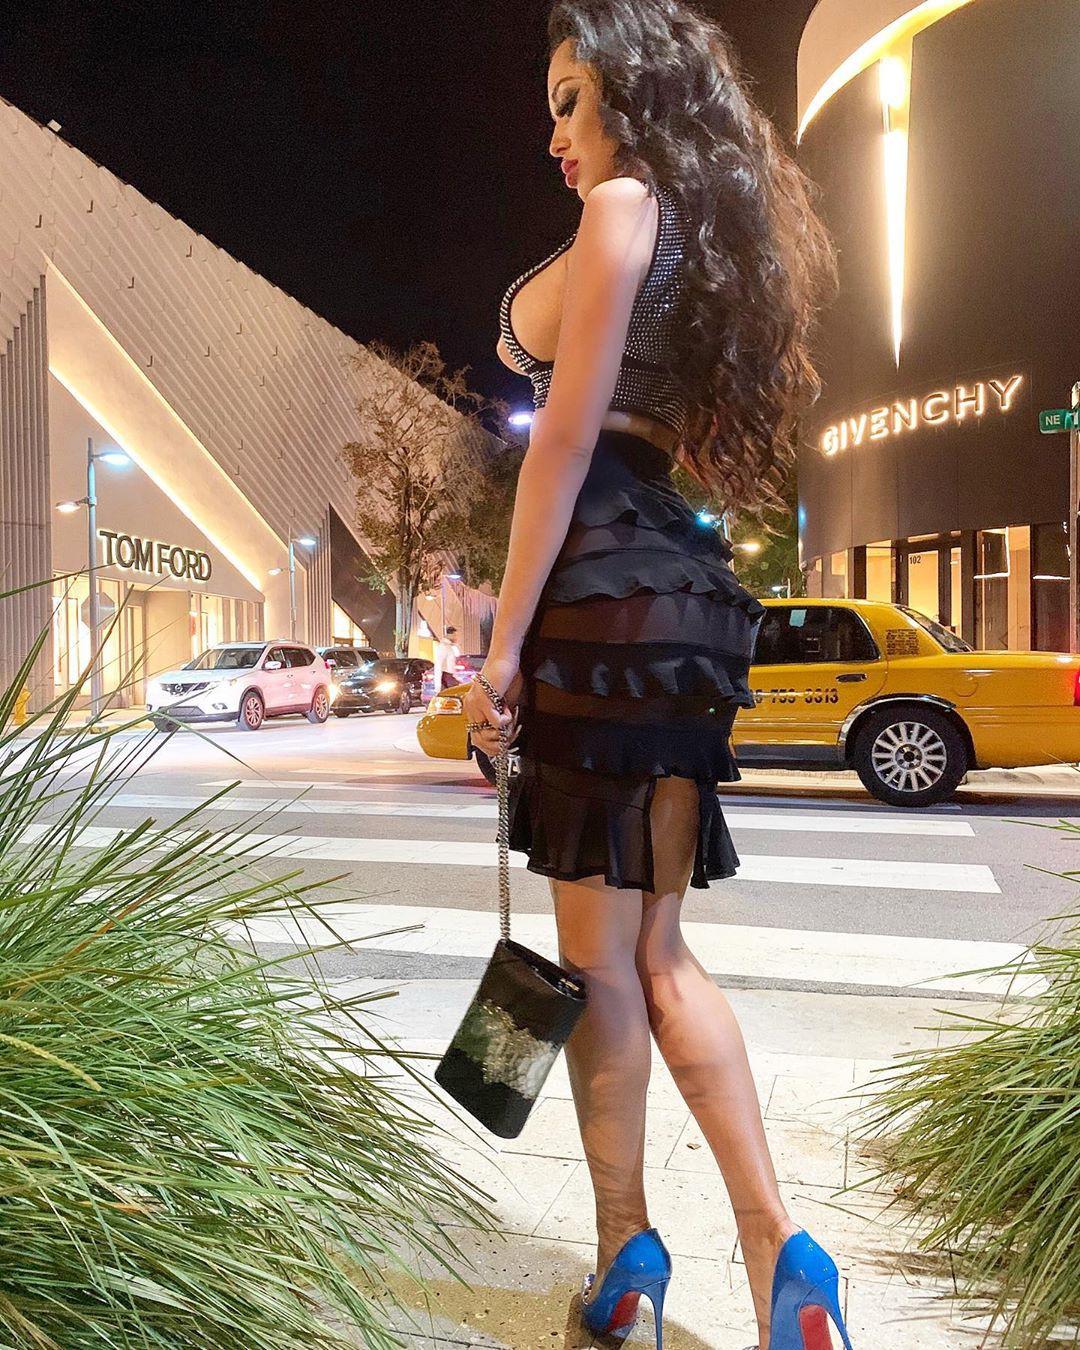 Playmate Kamila dress outfit pinterest, hot legs, hot legs photos